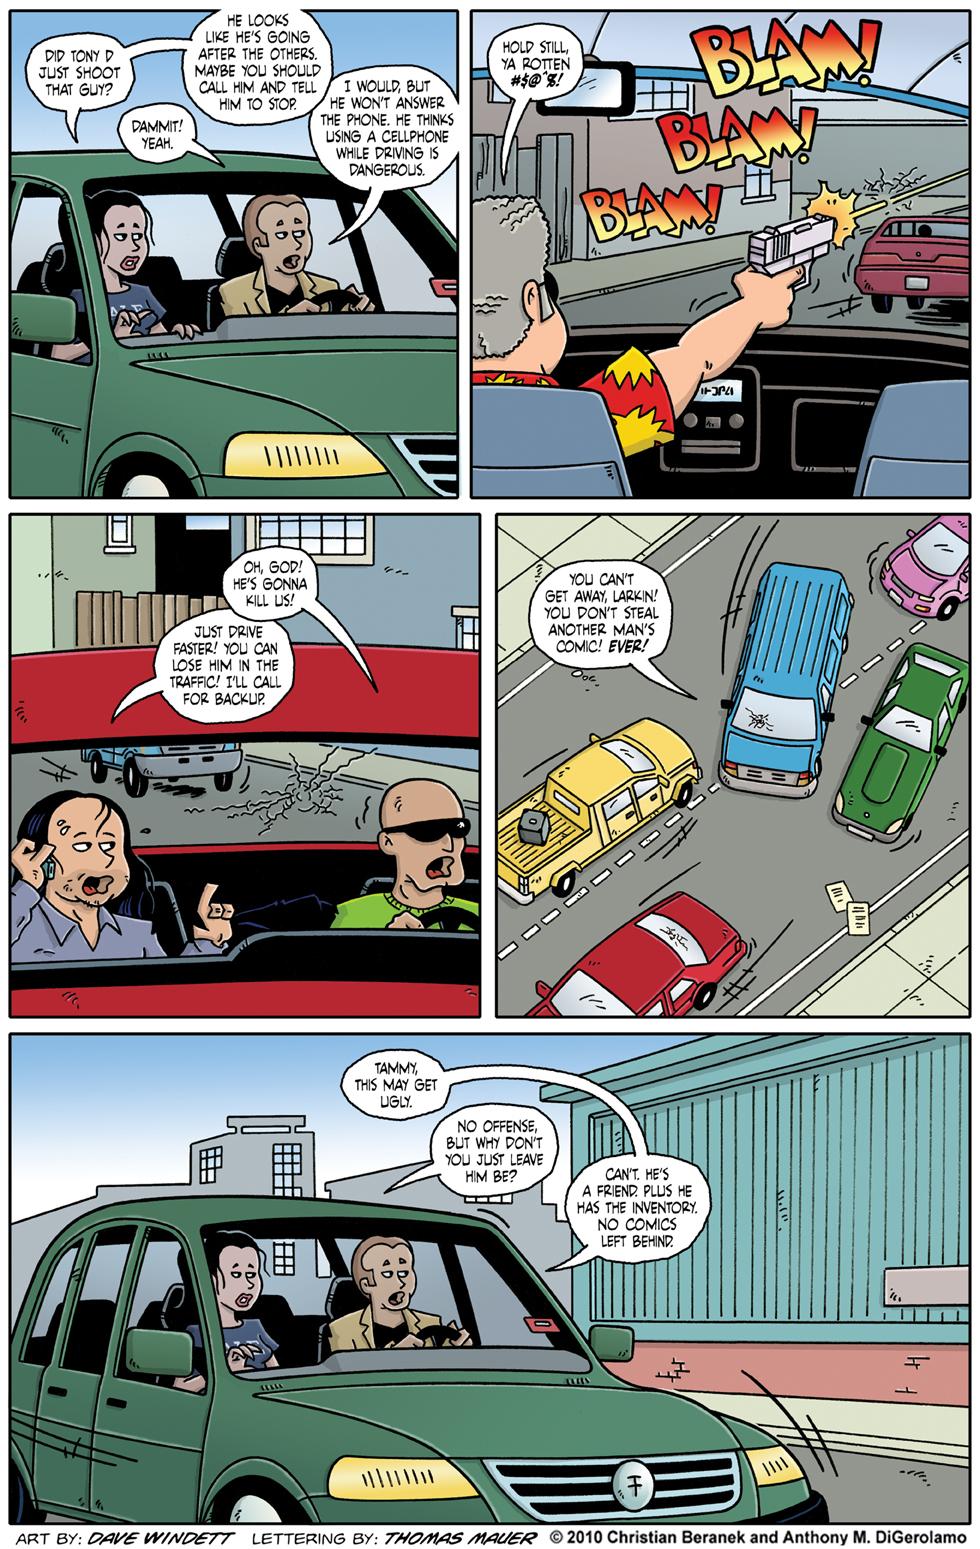 Comic Book Mafia #39: A Safe Driver